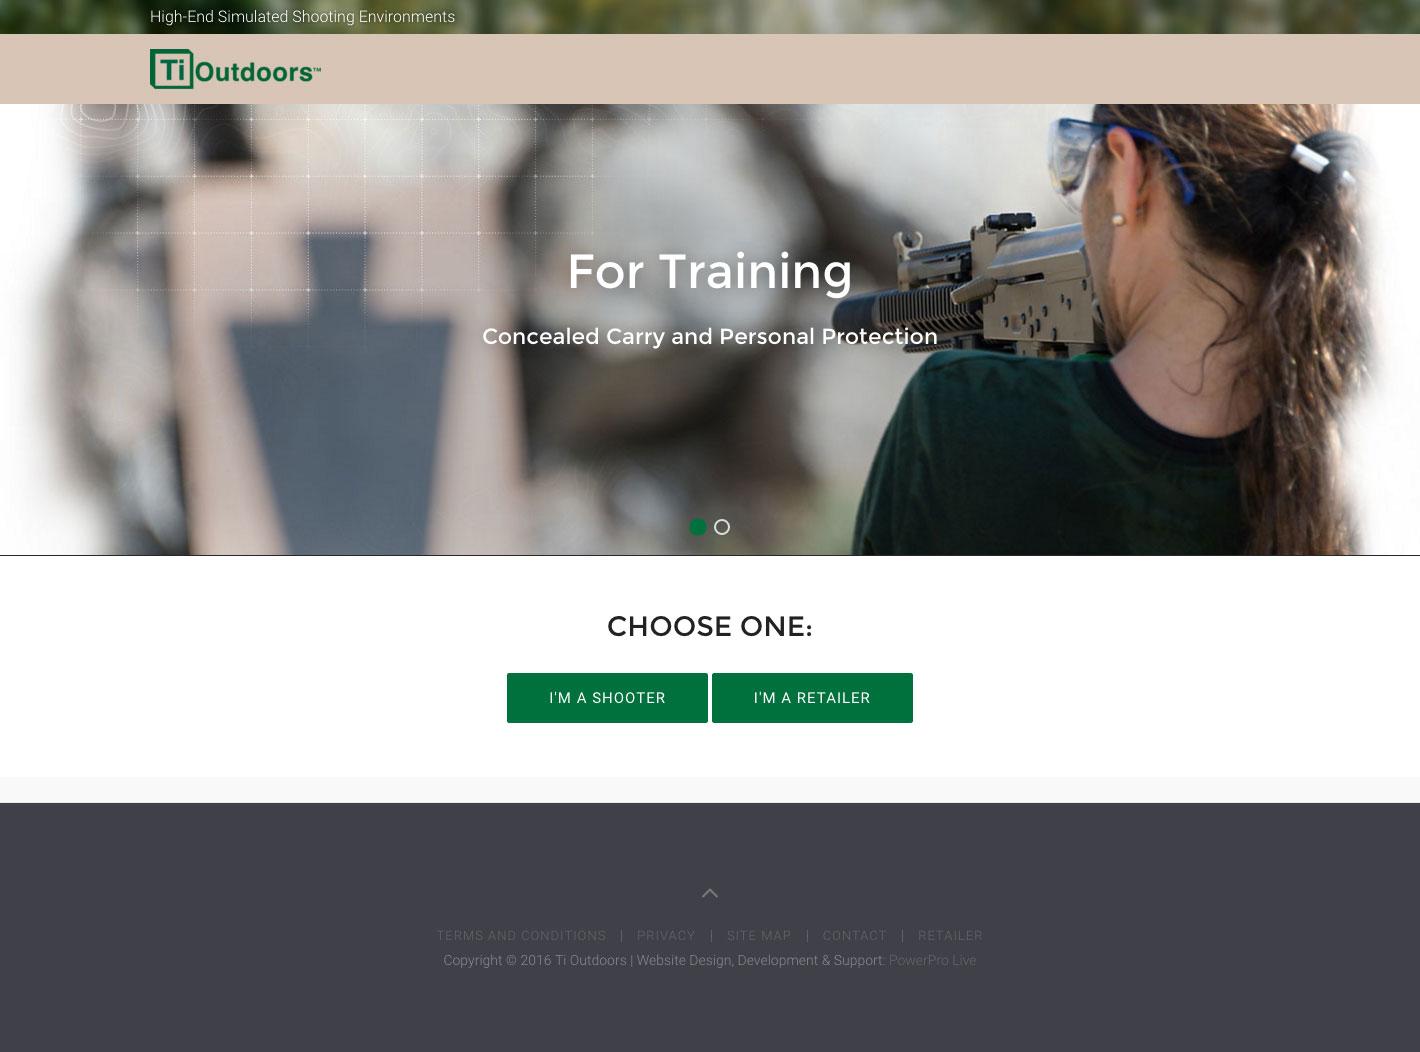 ti-outdoors-website